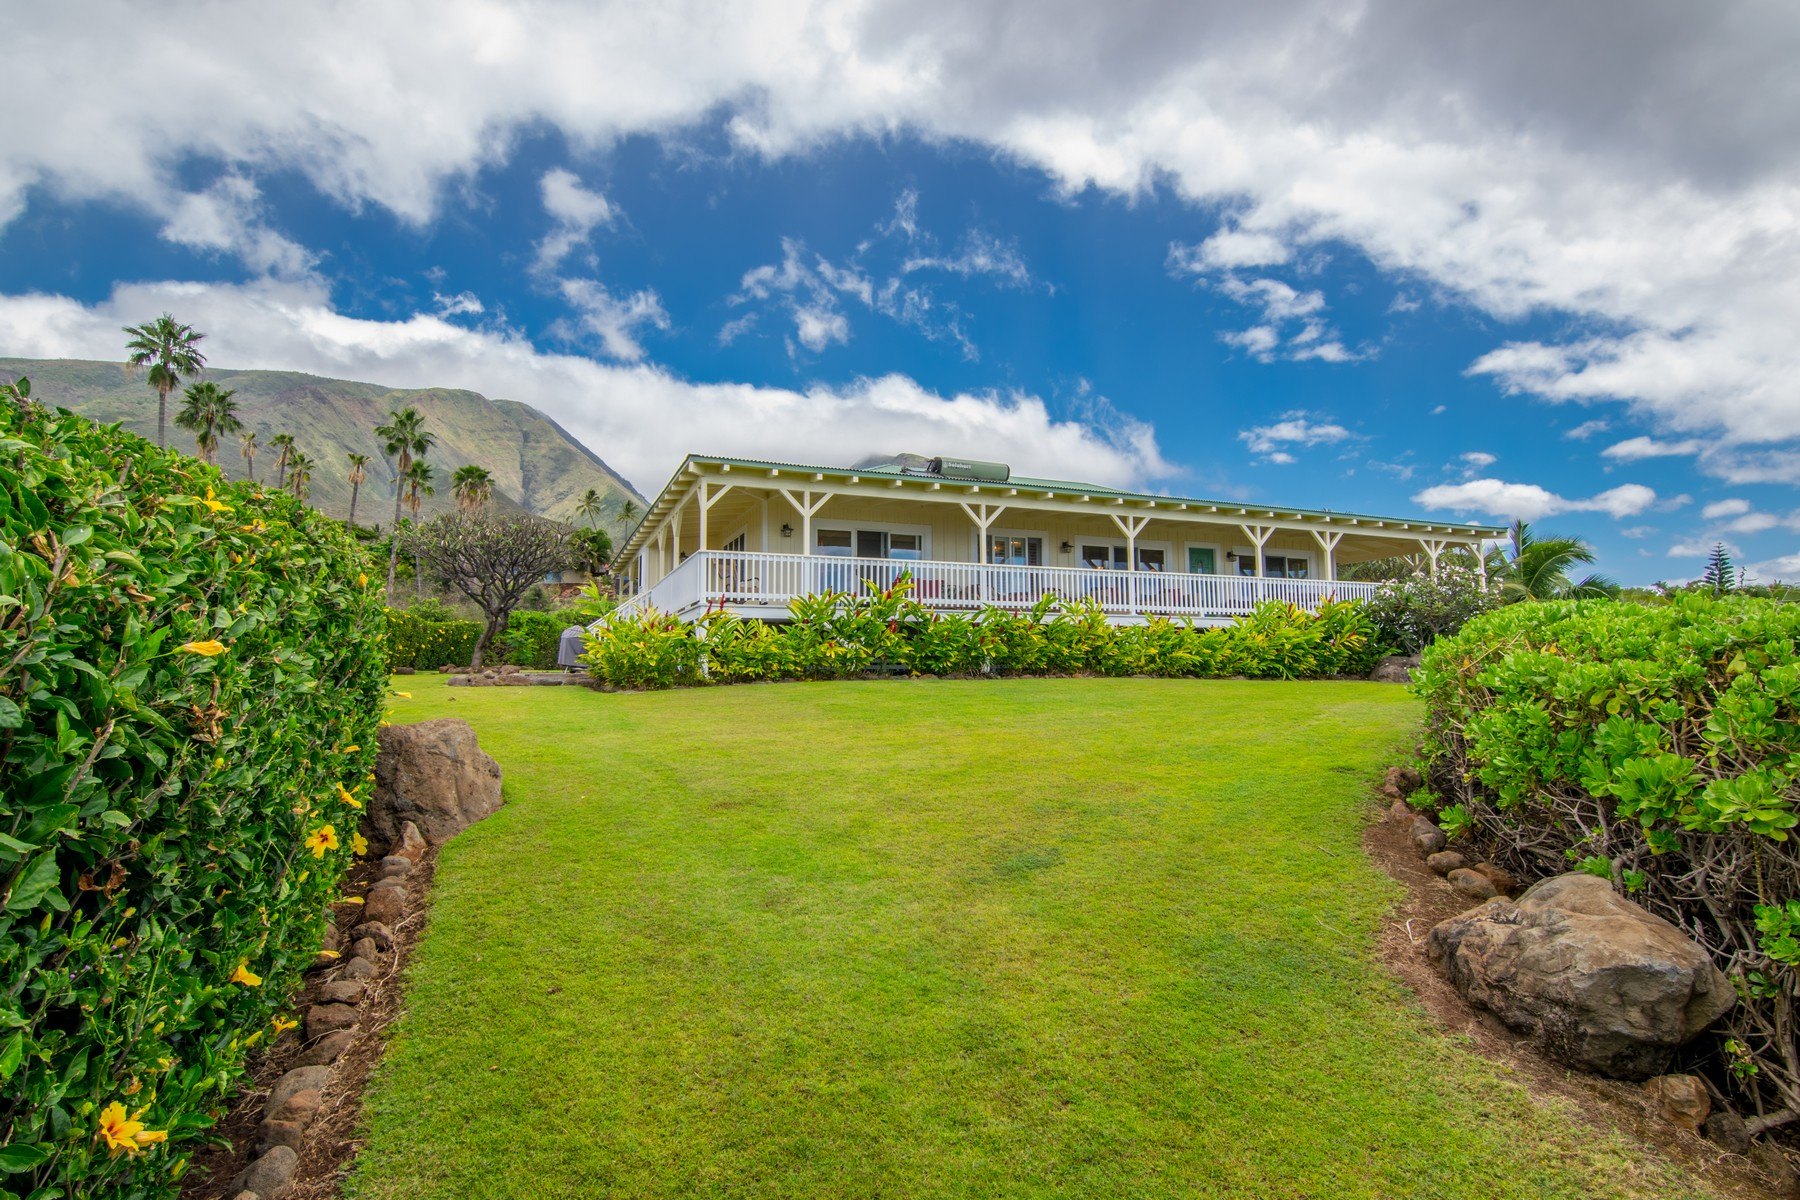 Single Family Home for Sale at Enjoy the Launiupoko Lifestyle 170 Paia Pohaku Place, Unit A Lahaina, Hawaii 96761 United States